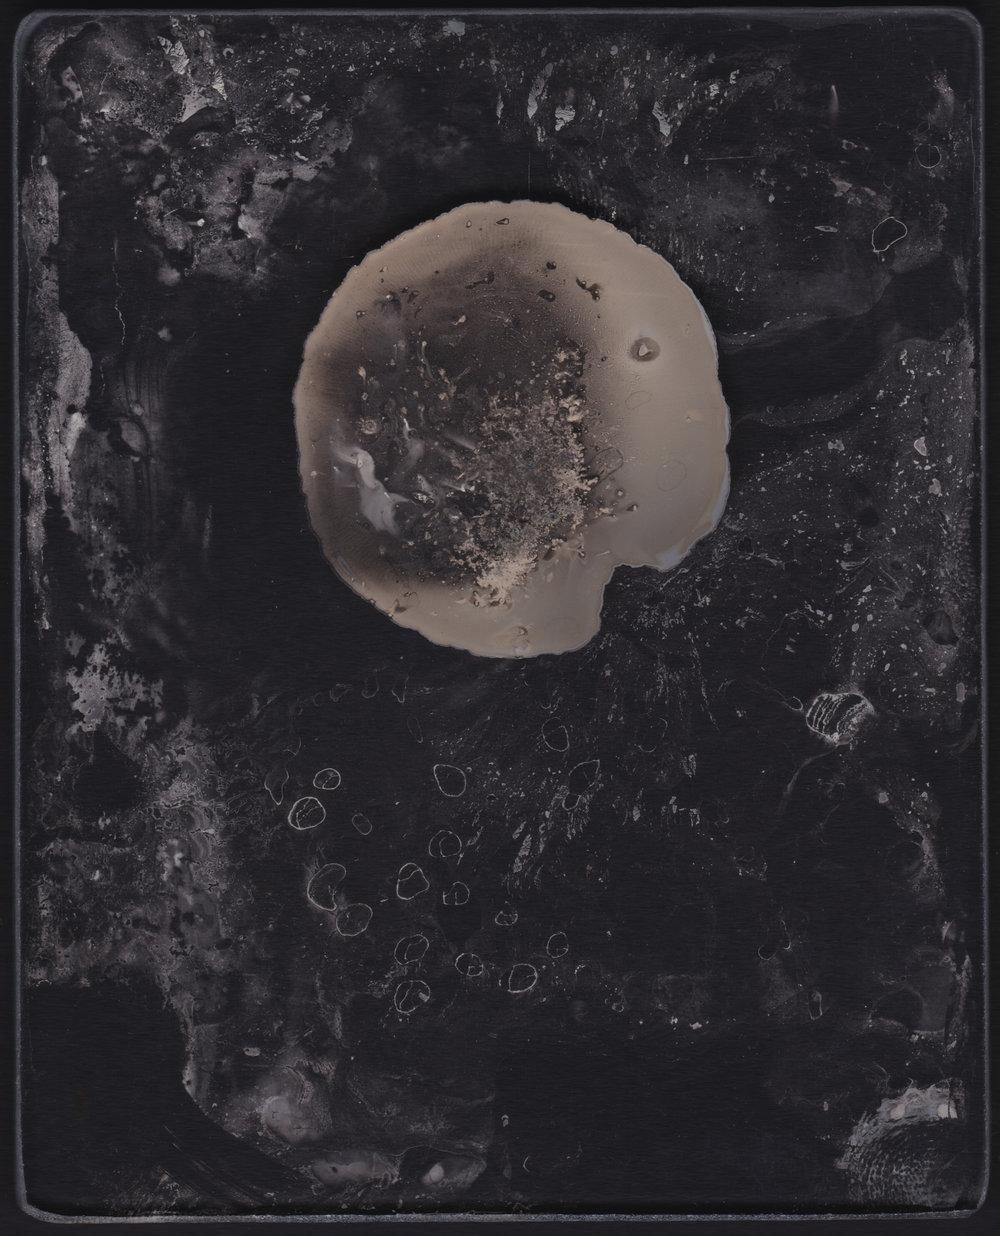 Moon quater-0002.jpg